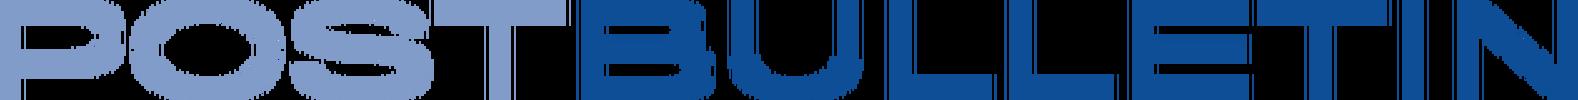 Rochester Today logo